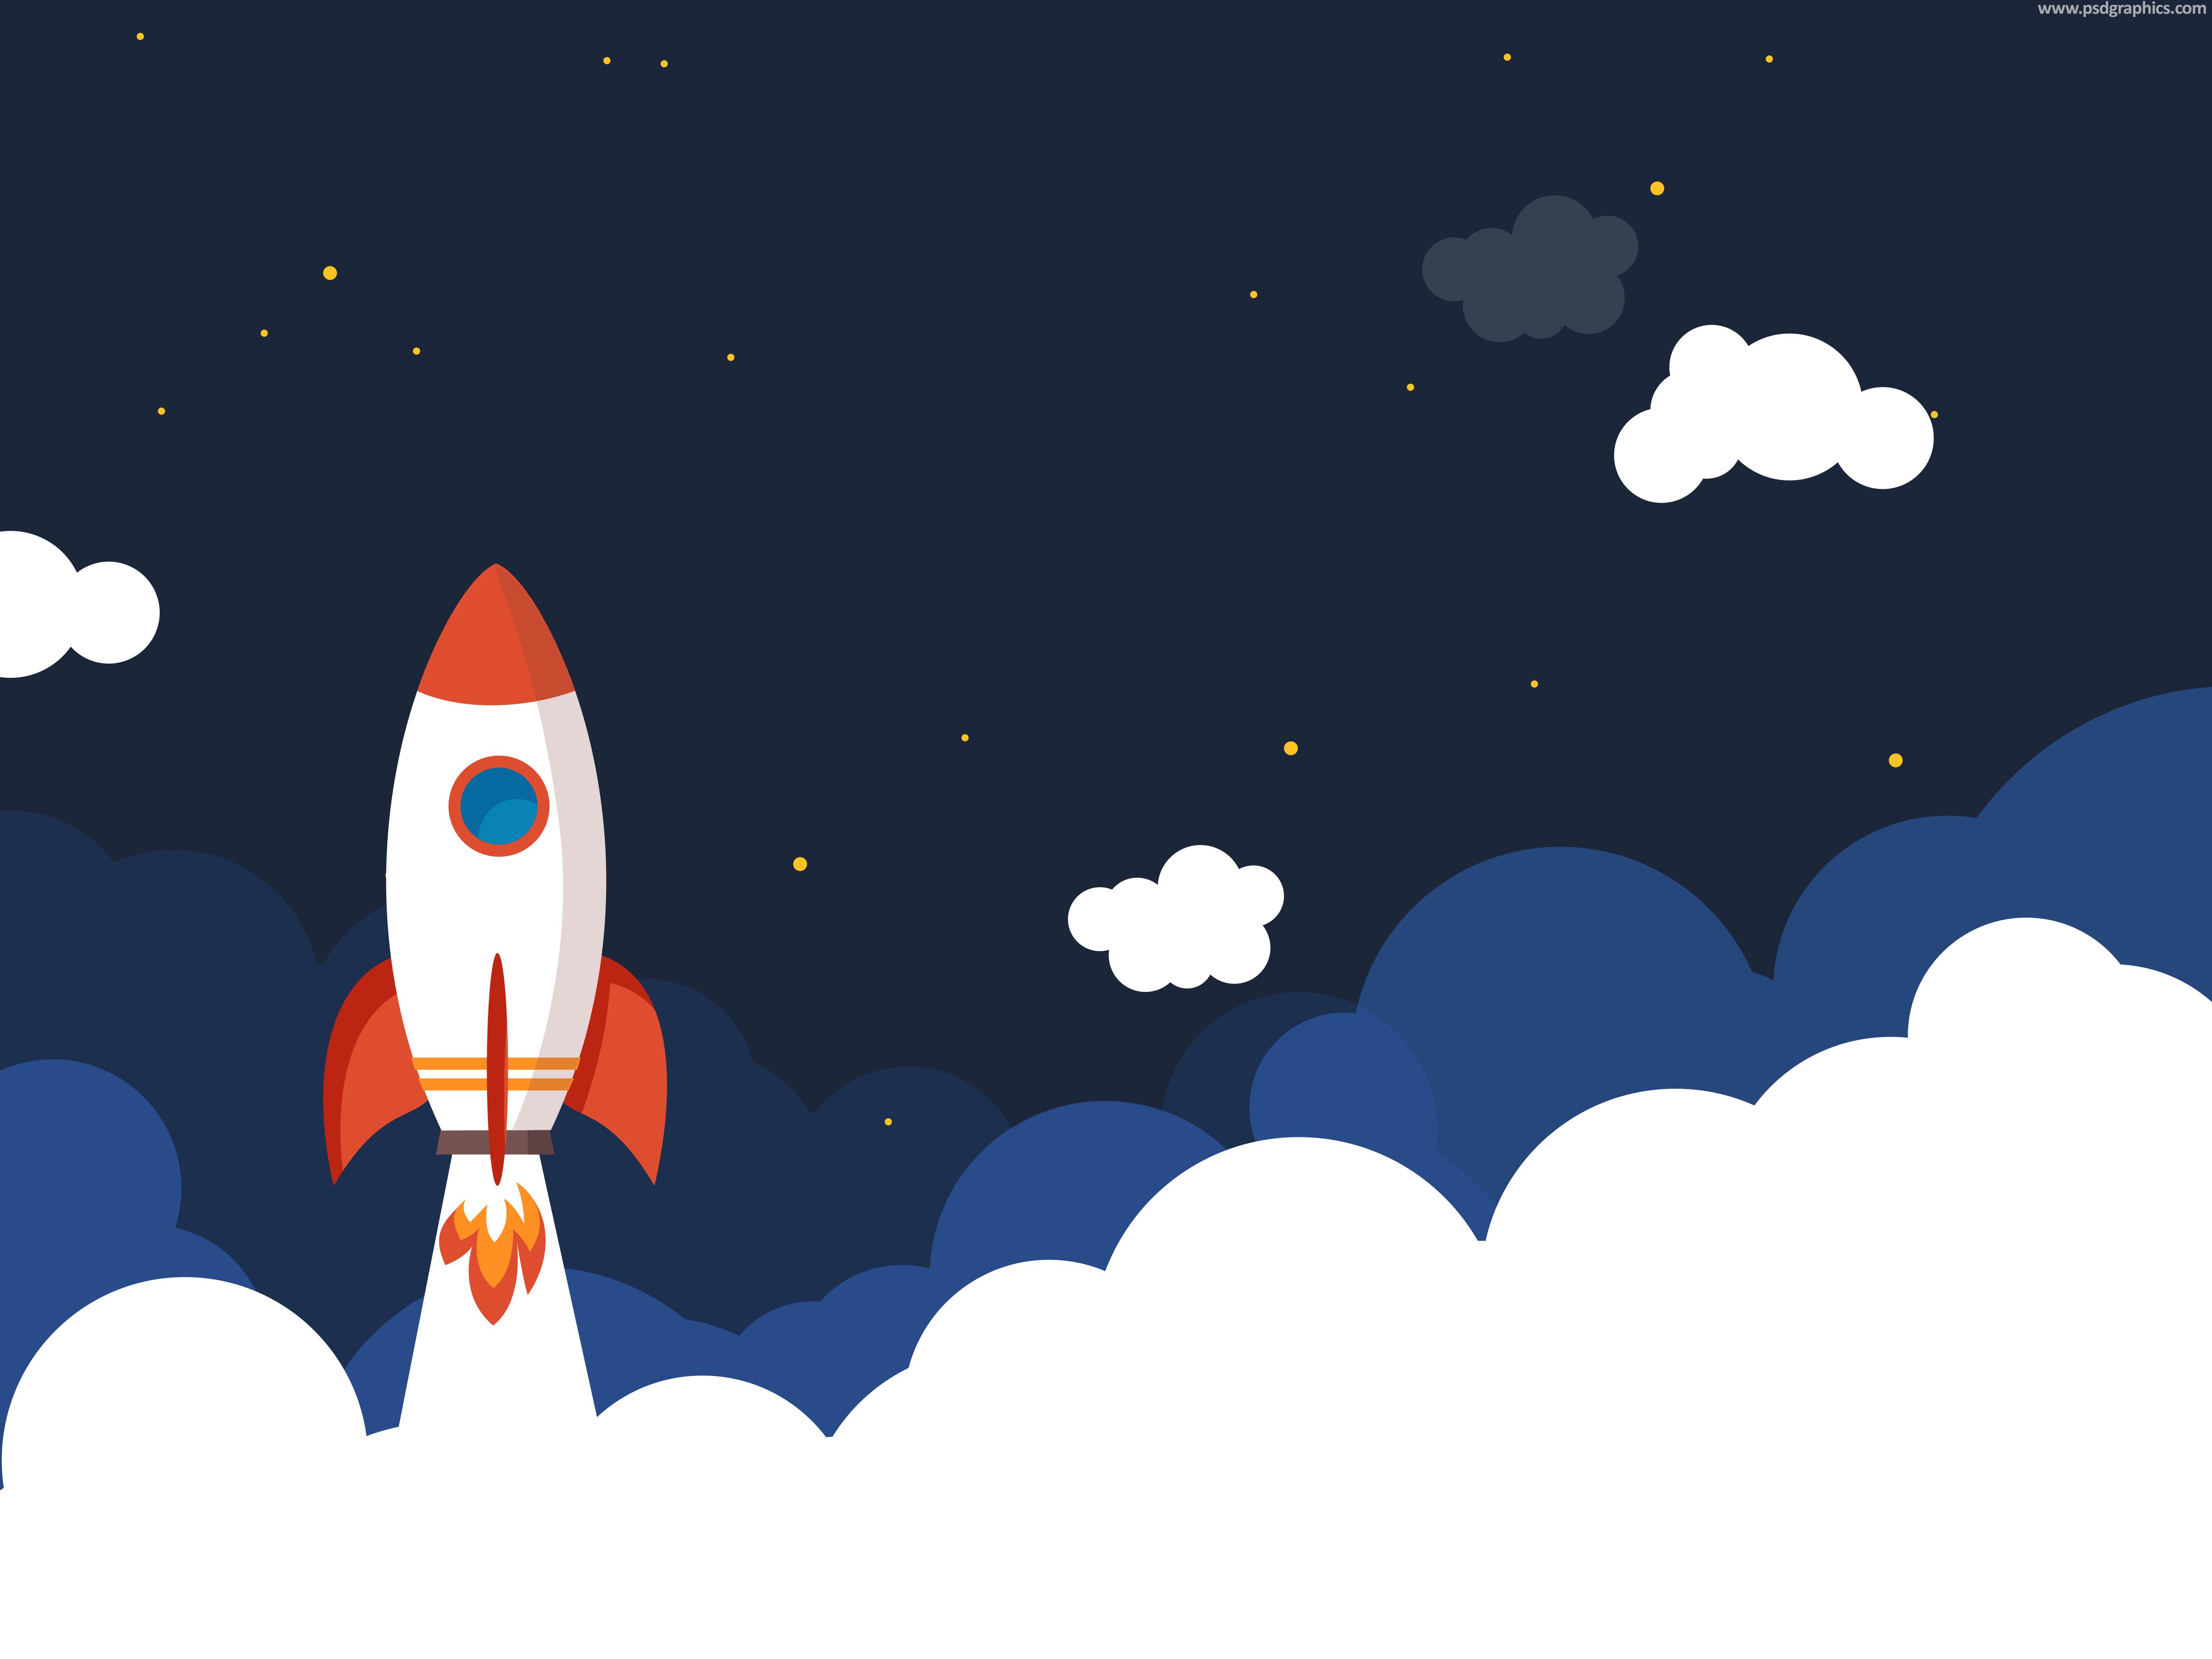 Night Sky 3d Wallpaper Rocket Launch Illustration Psd Psdgraphics